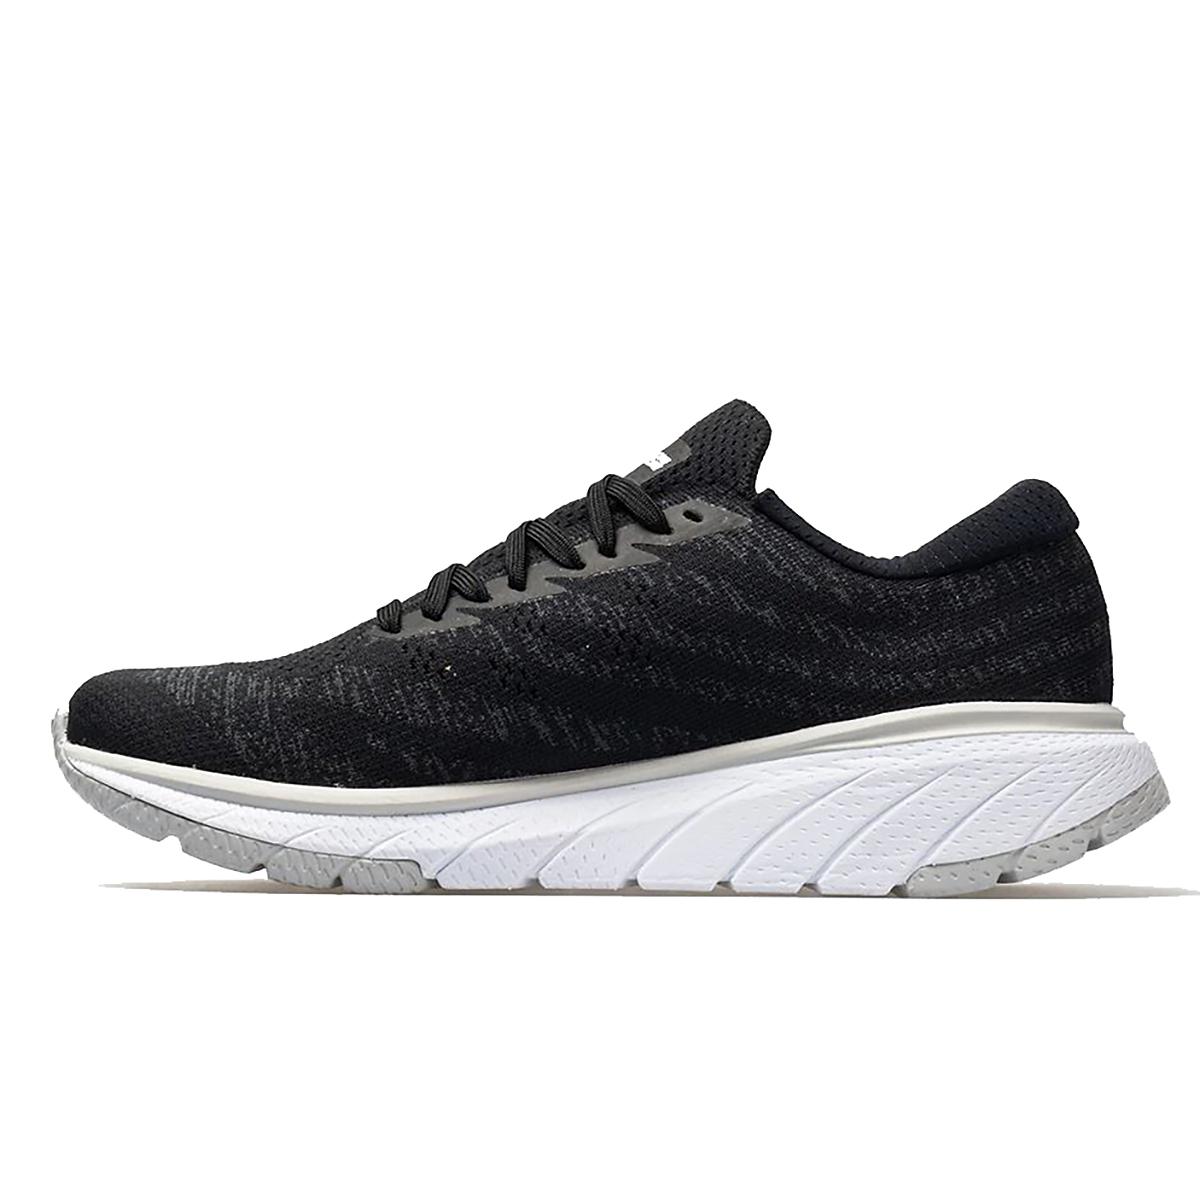 Men's Hoka One One Cavu 3 Running Shoe - Color: Black/White - Size: 7 - Width: Regular, Black/White, large, image 2